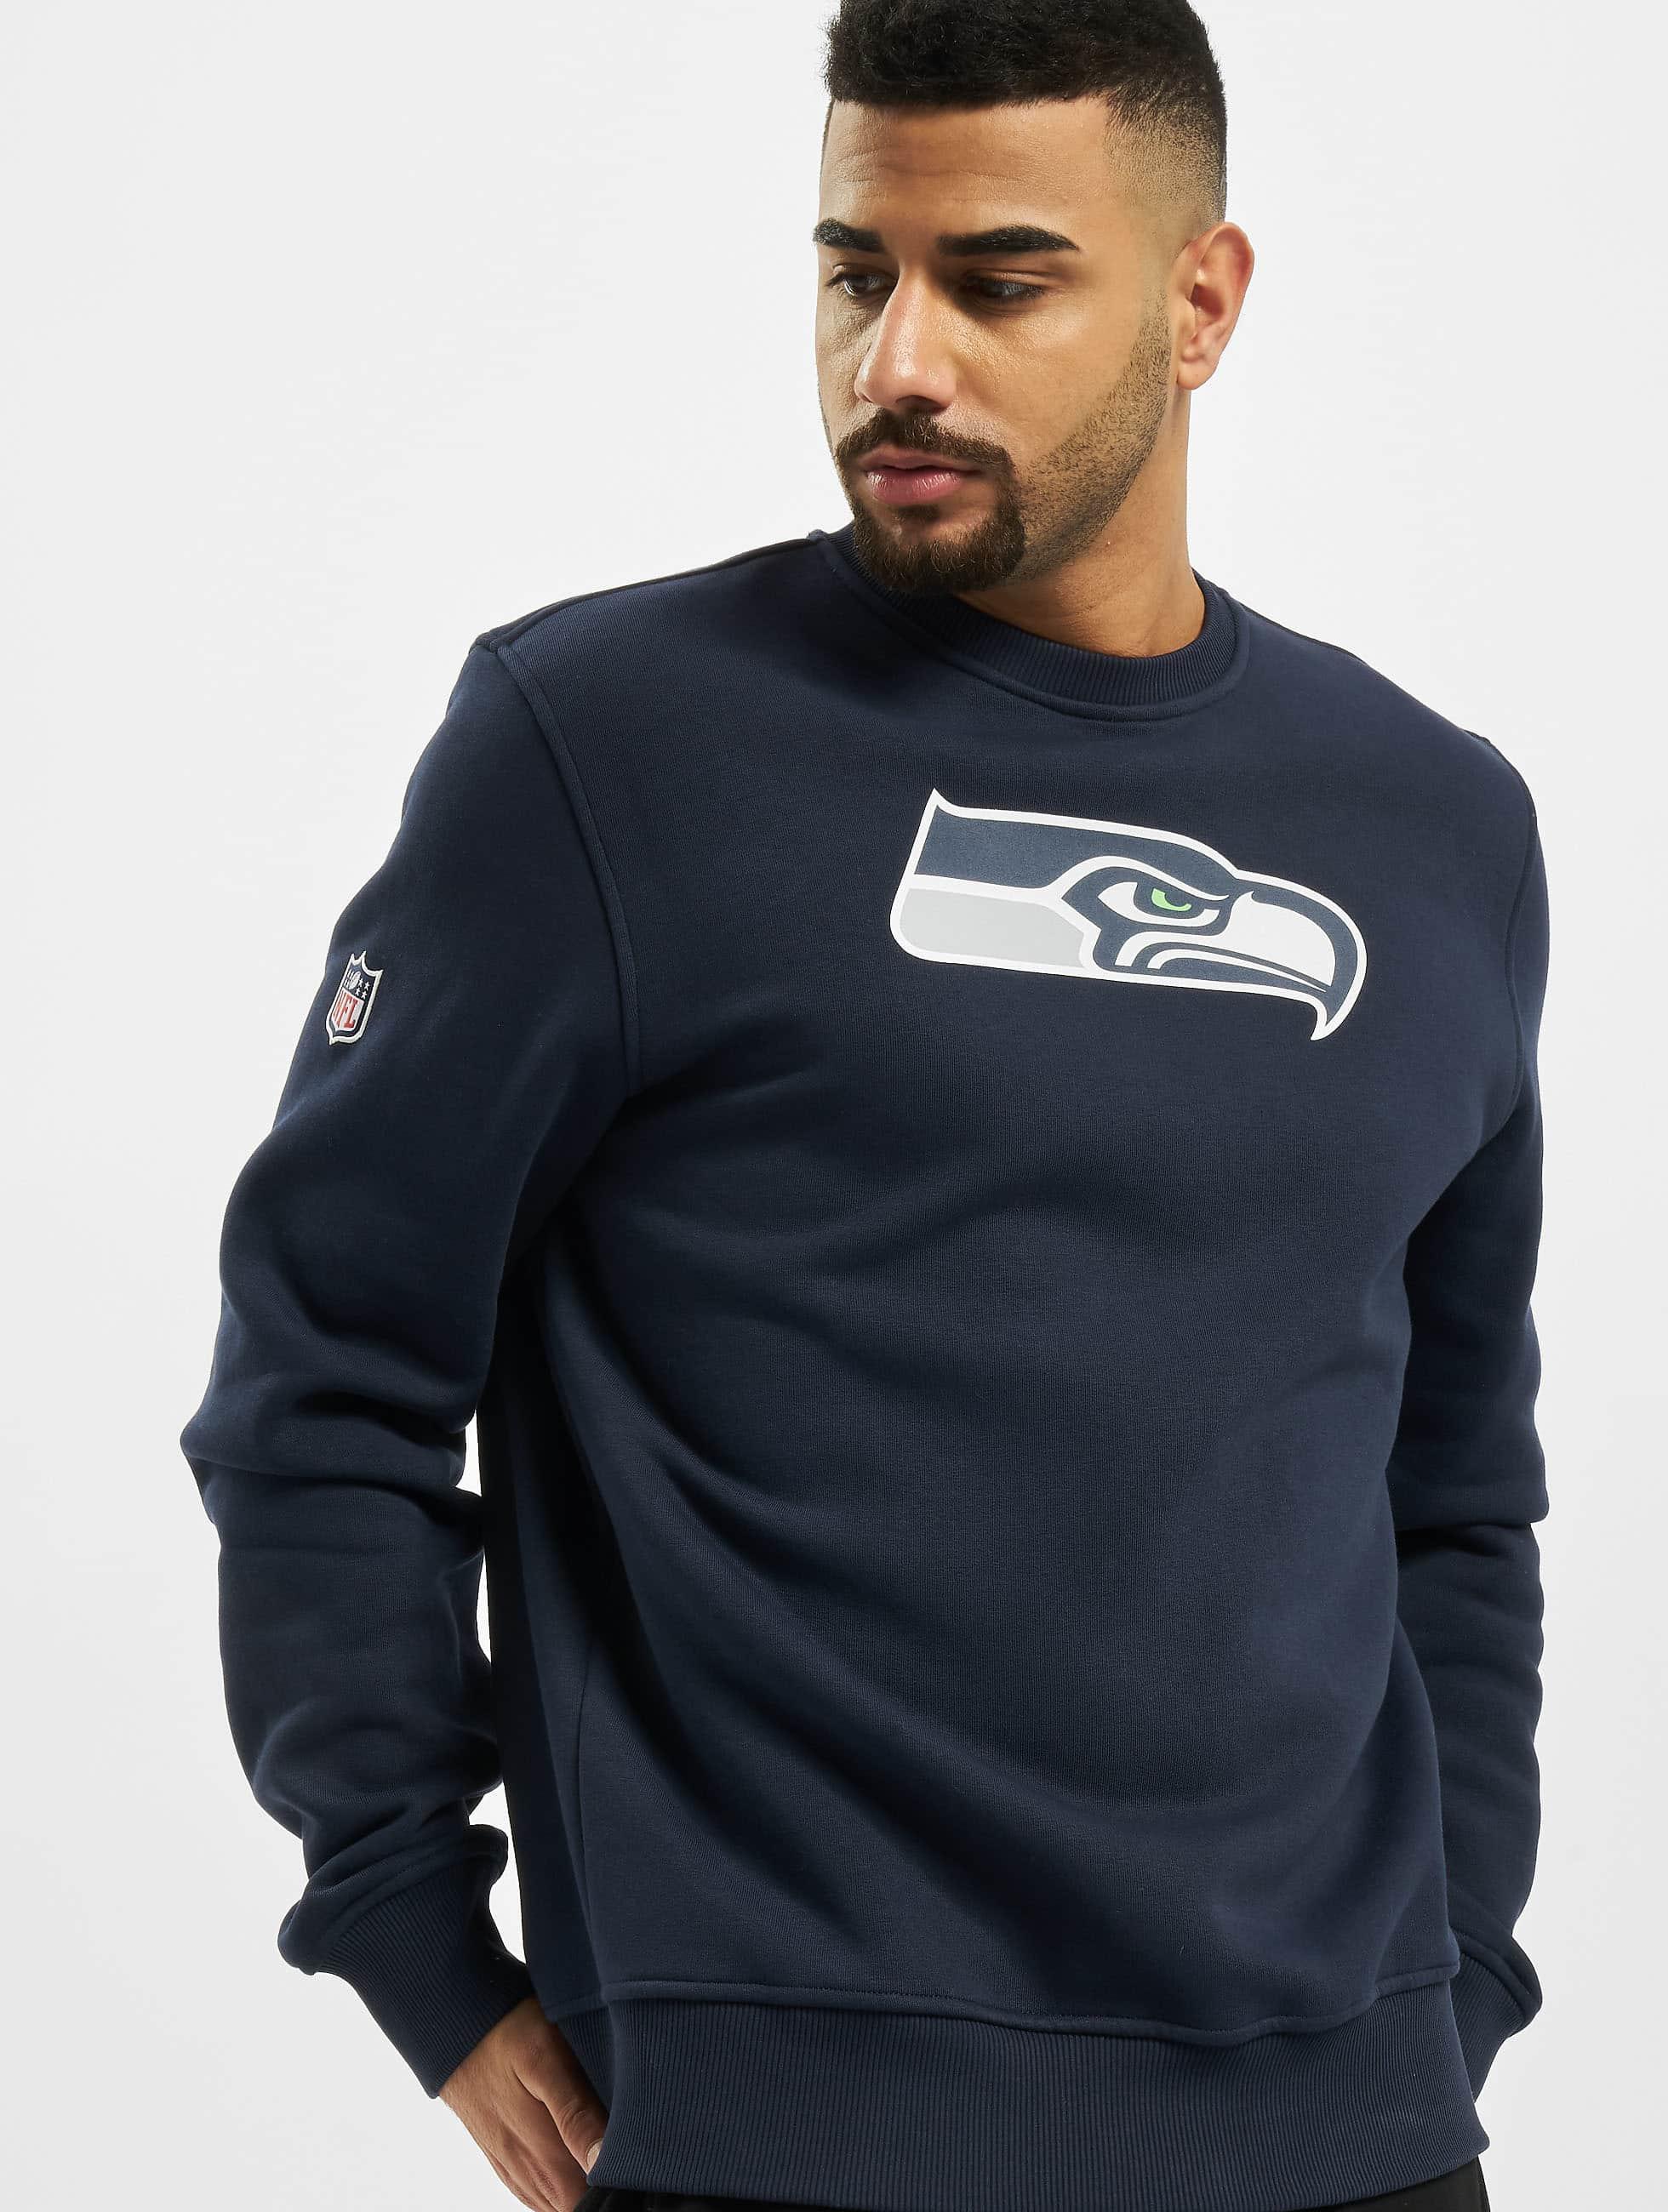 new era herren pullover team logo seattle seahawks in blau. Black Bedroom Furniture Sets. Home Design Ideas